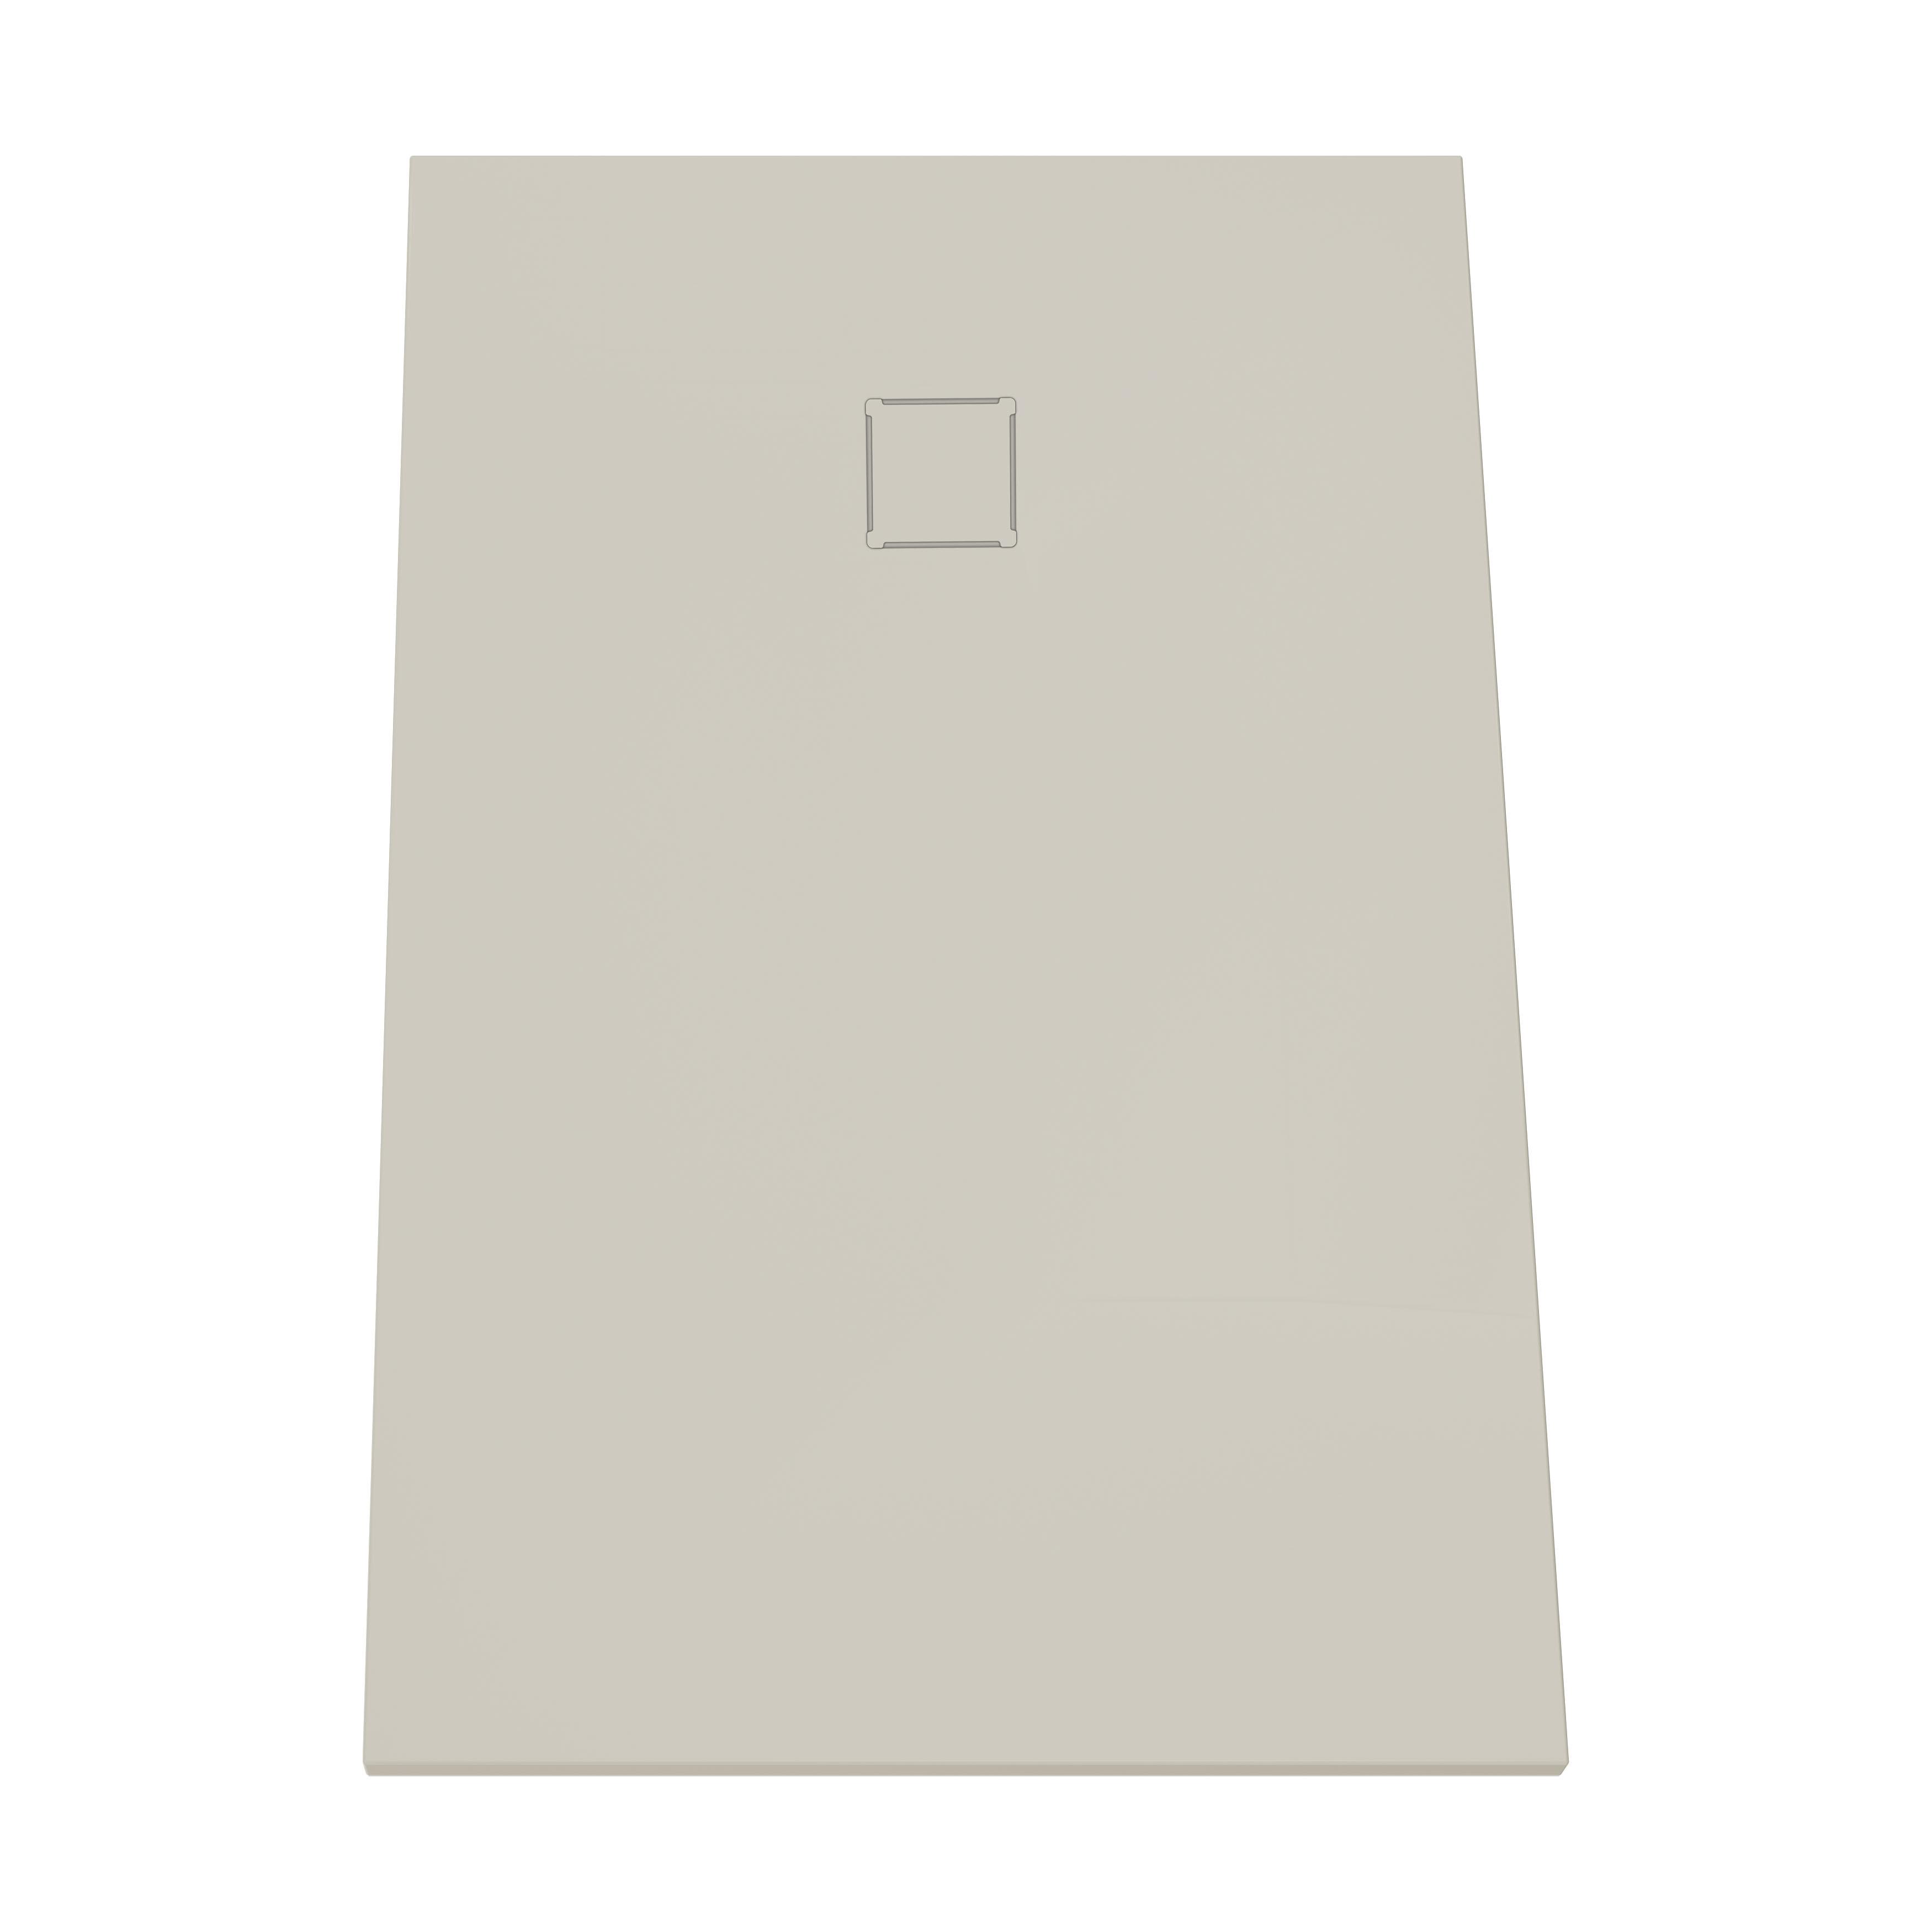 V-stone, receveur ultra plat en solid stone, 140  x  90 cm, taupe